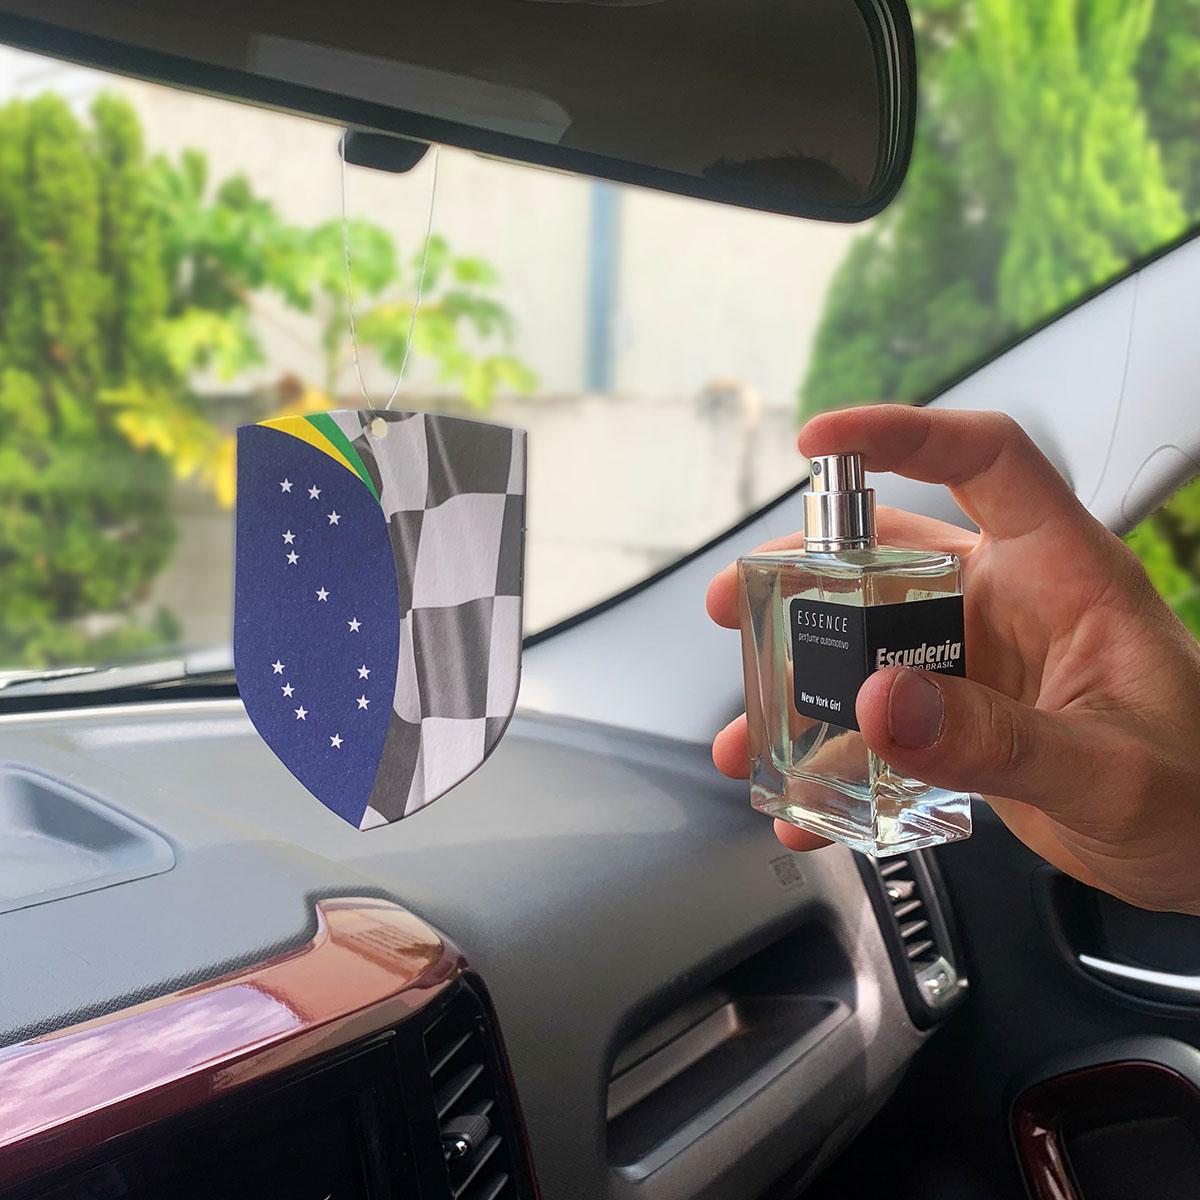 Perfume automotivo concentrado 50ml Invicto - Escuderia do Brasil